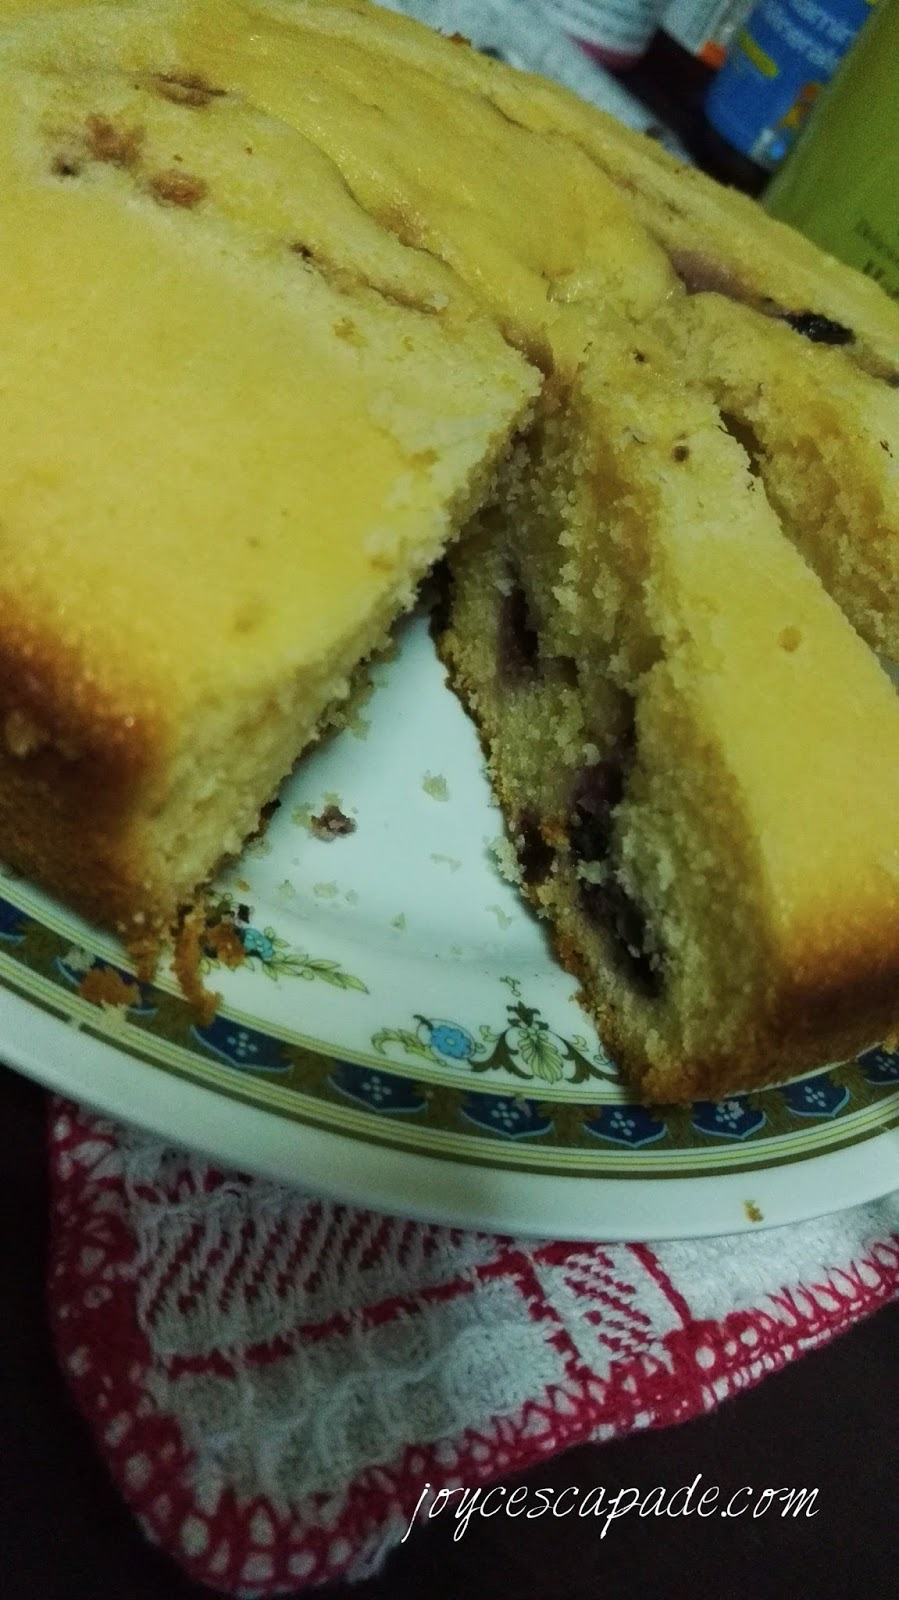 Turn Cake Mix Into Muffins